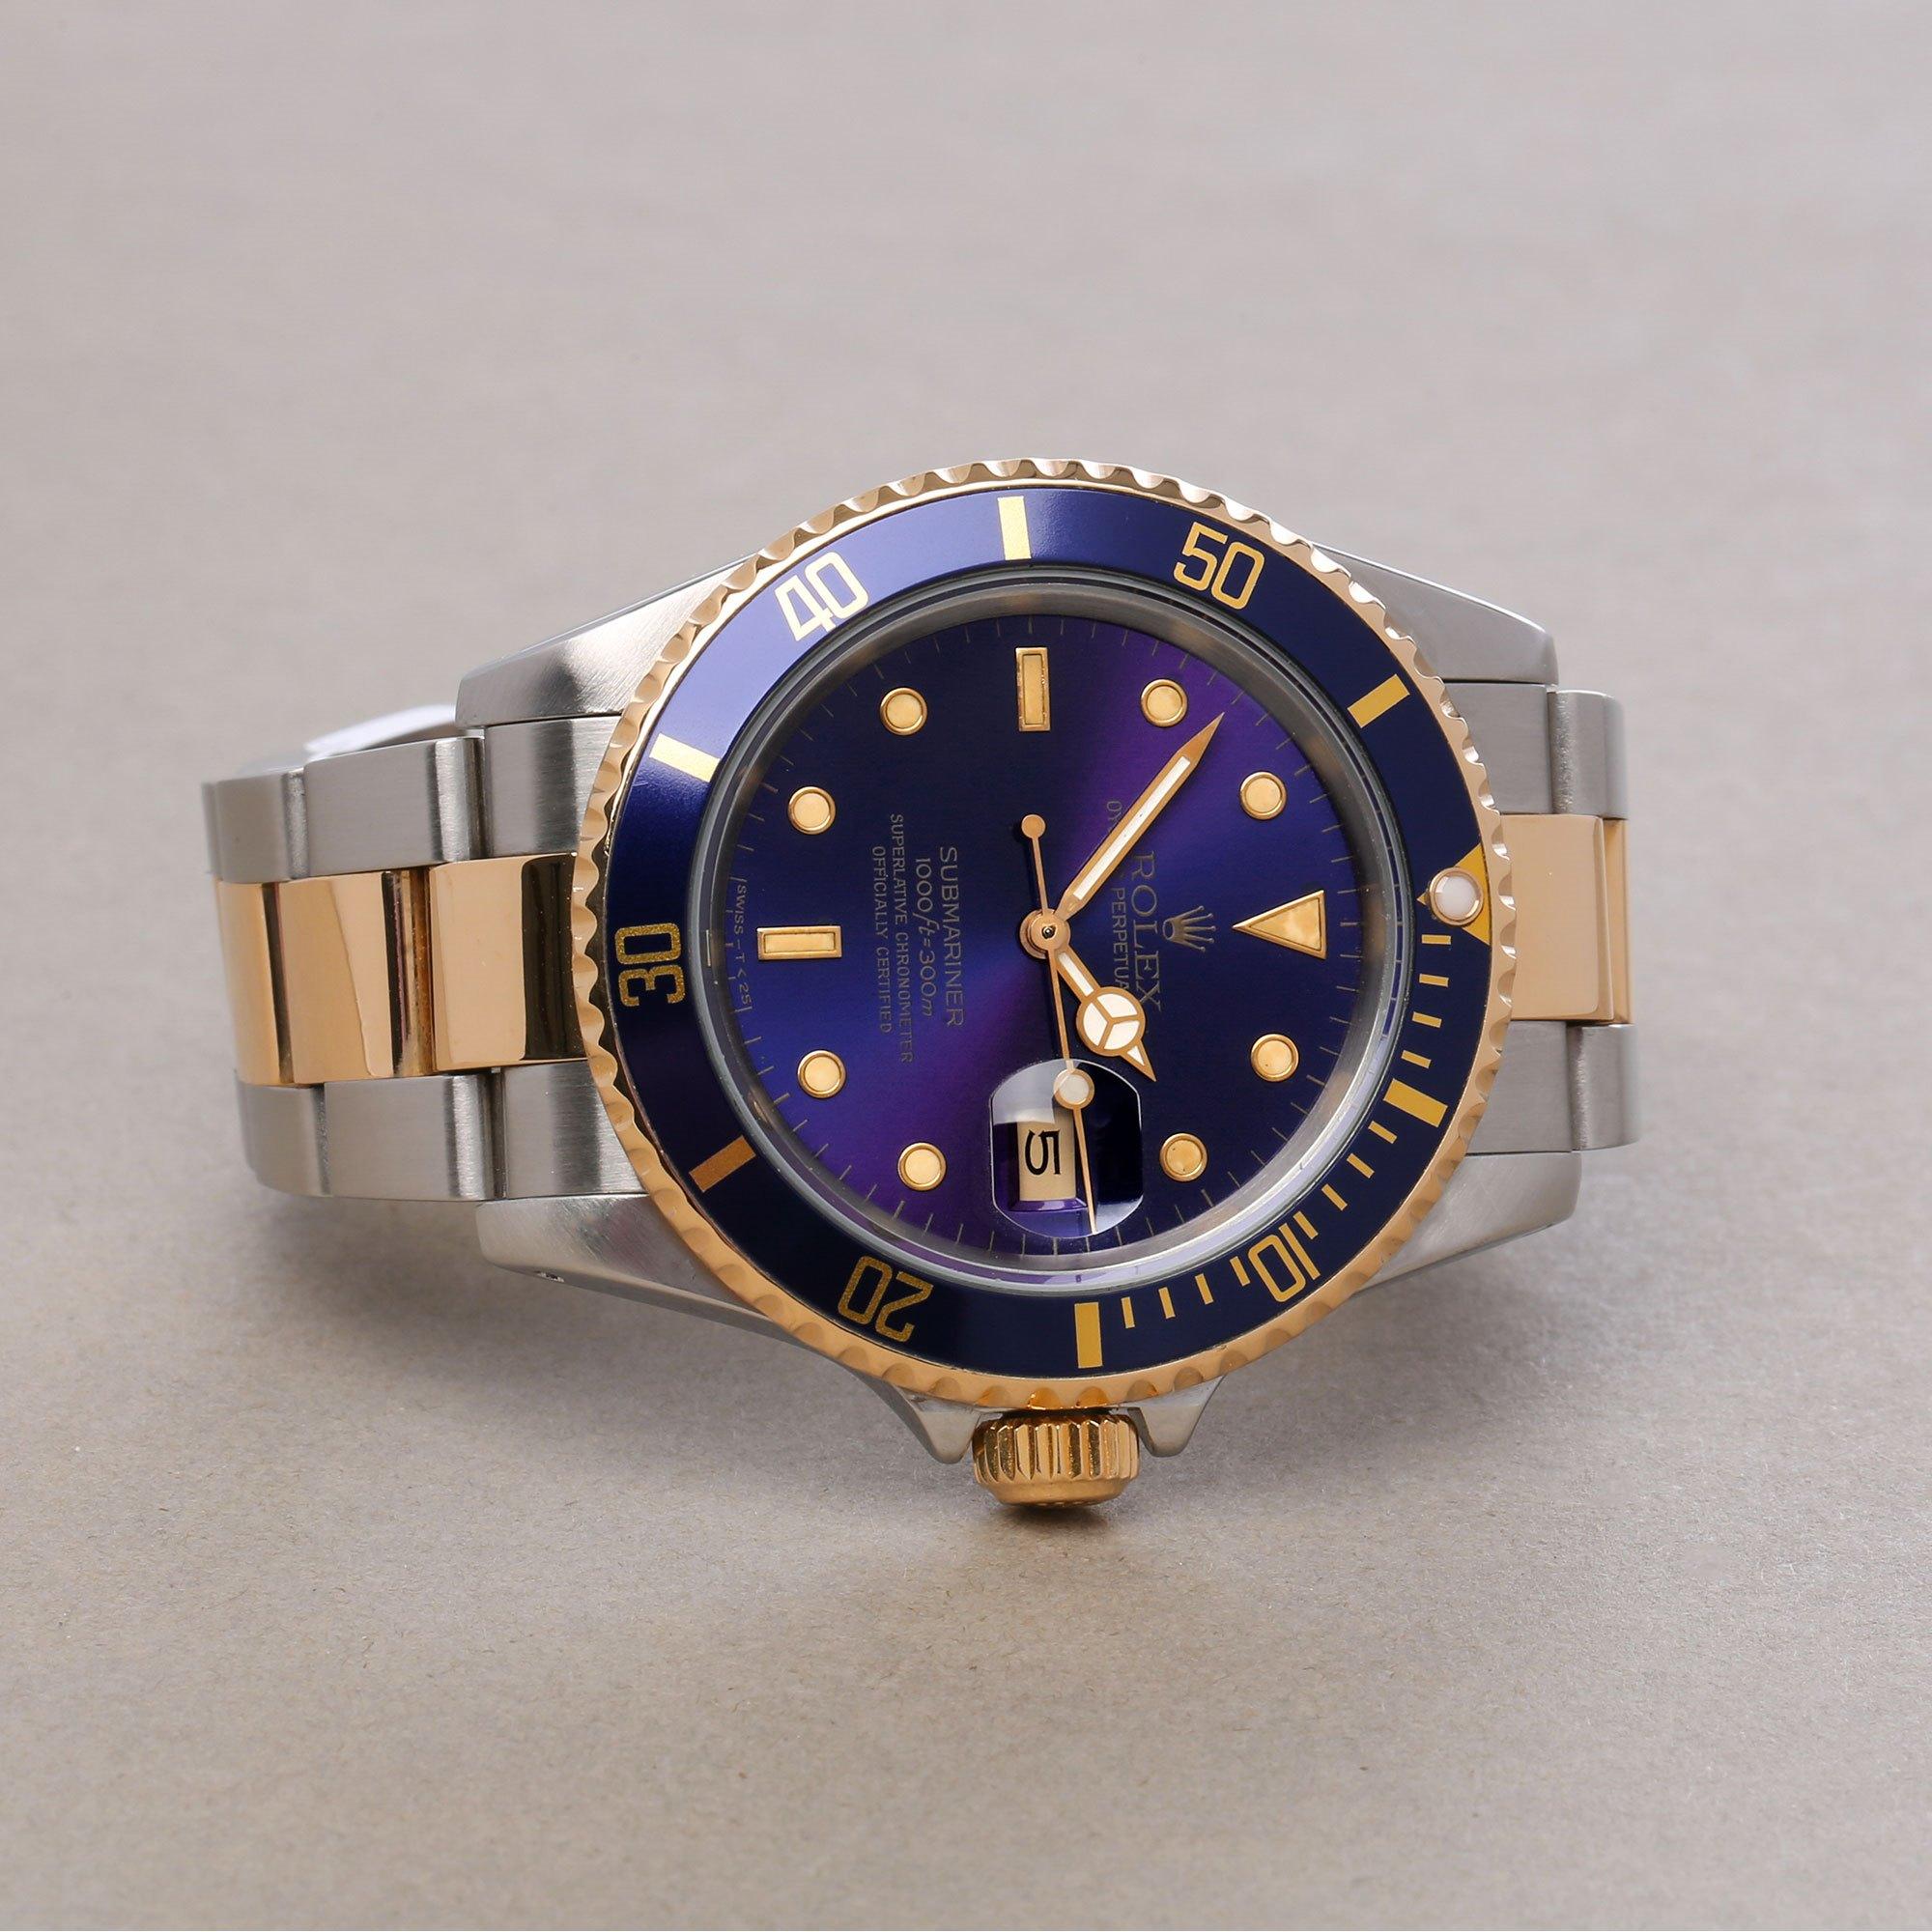 Rolex Submariner Date Purple 18K Yellow Gold & Stainless Steel 16613